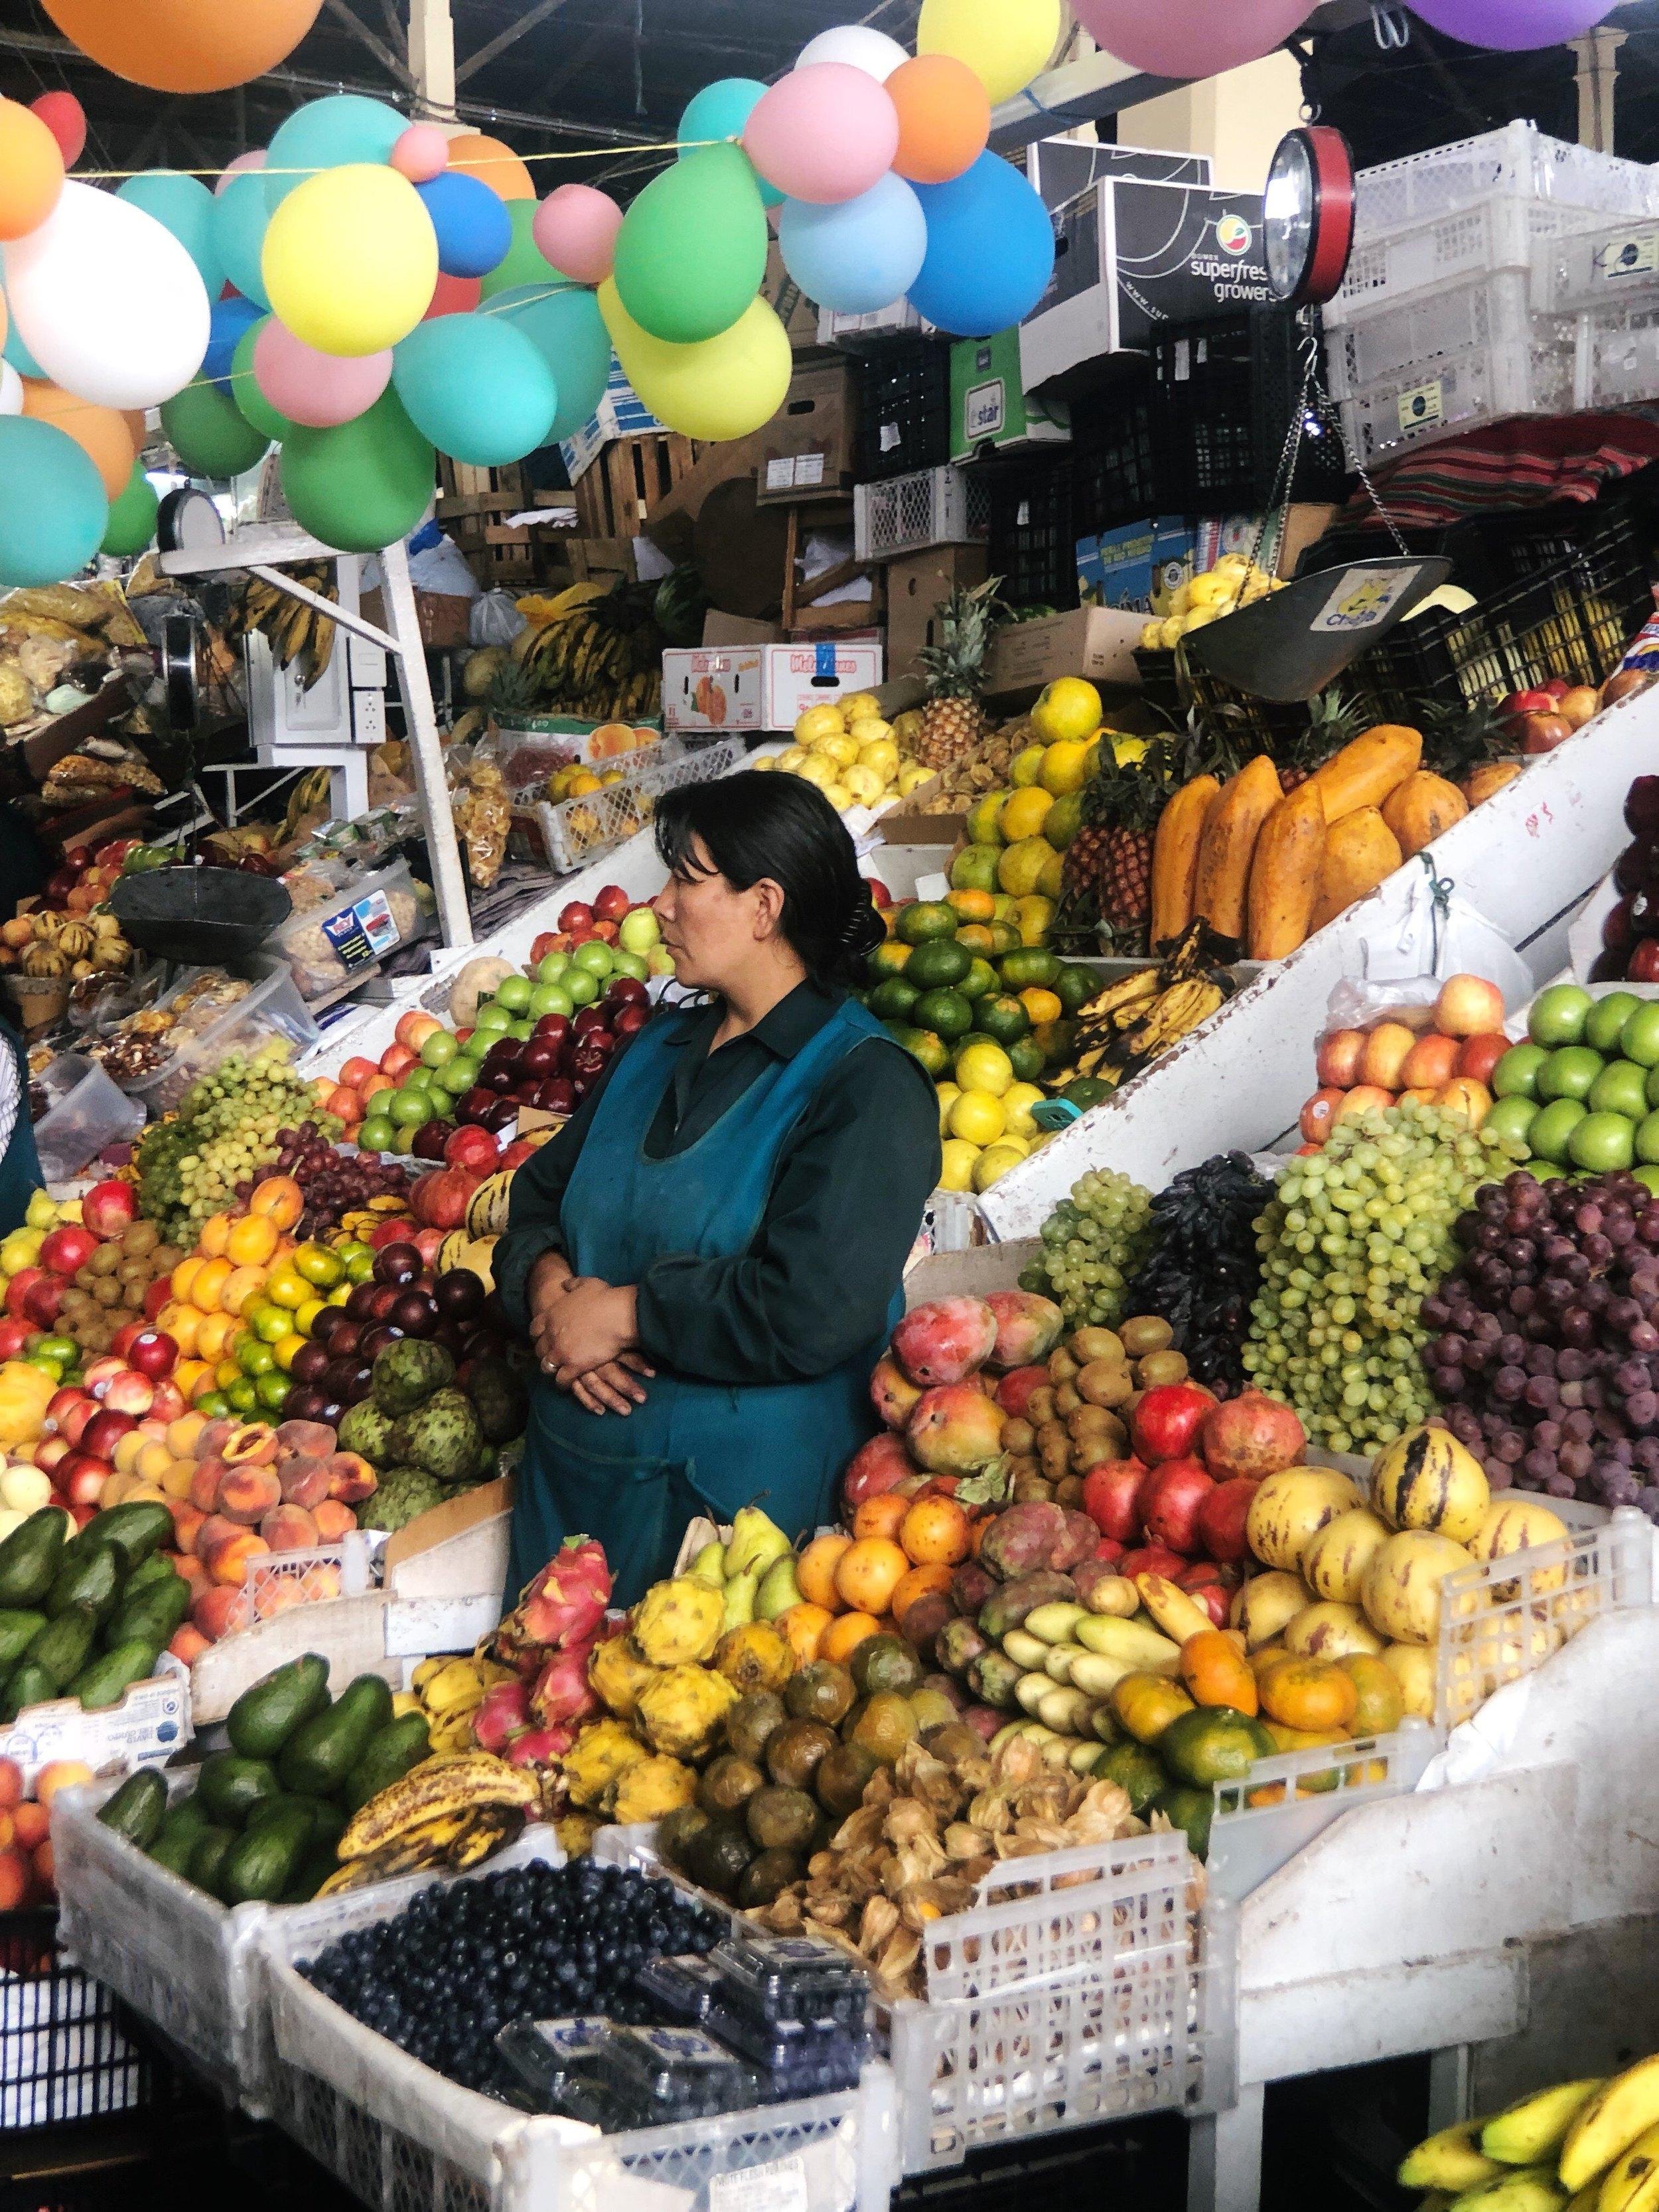 san pedro market-cusco-peru-shopping-food-textiles-south america- travel tips-2